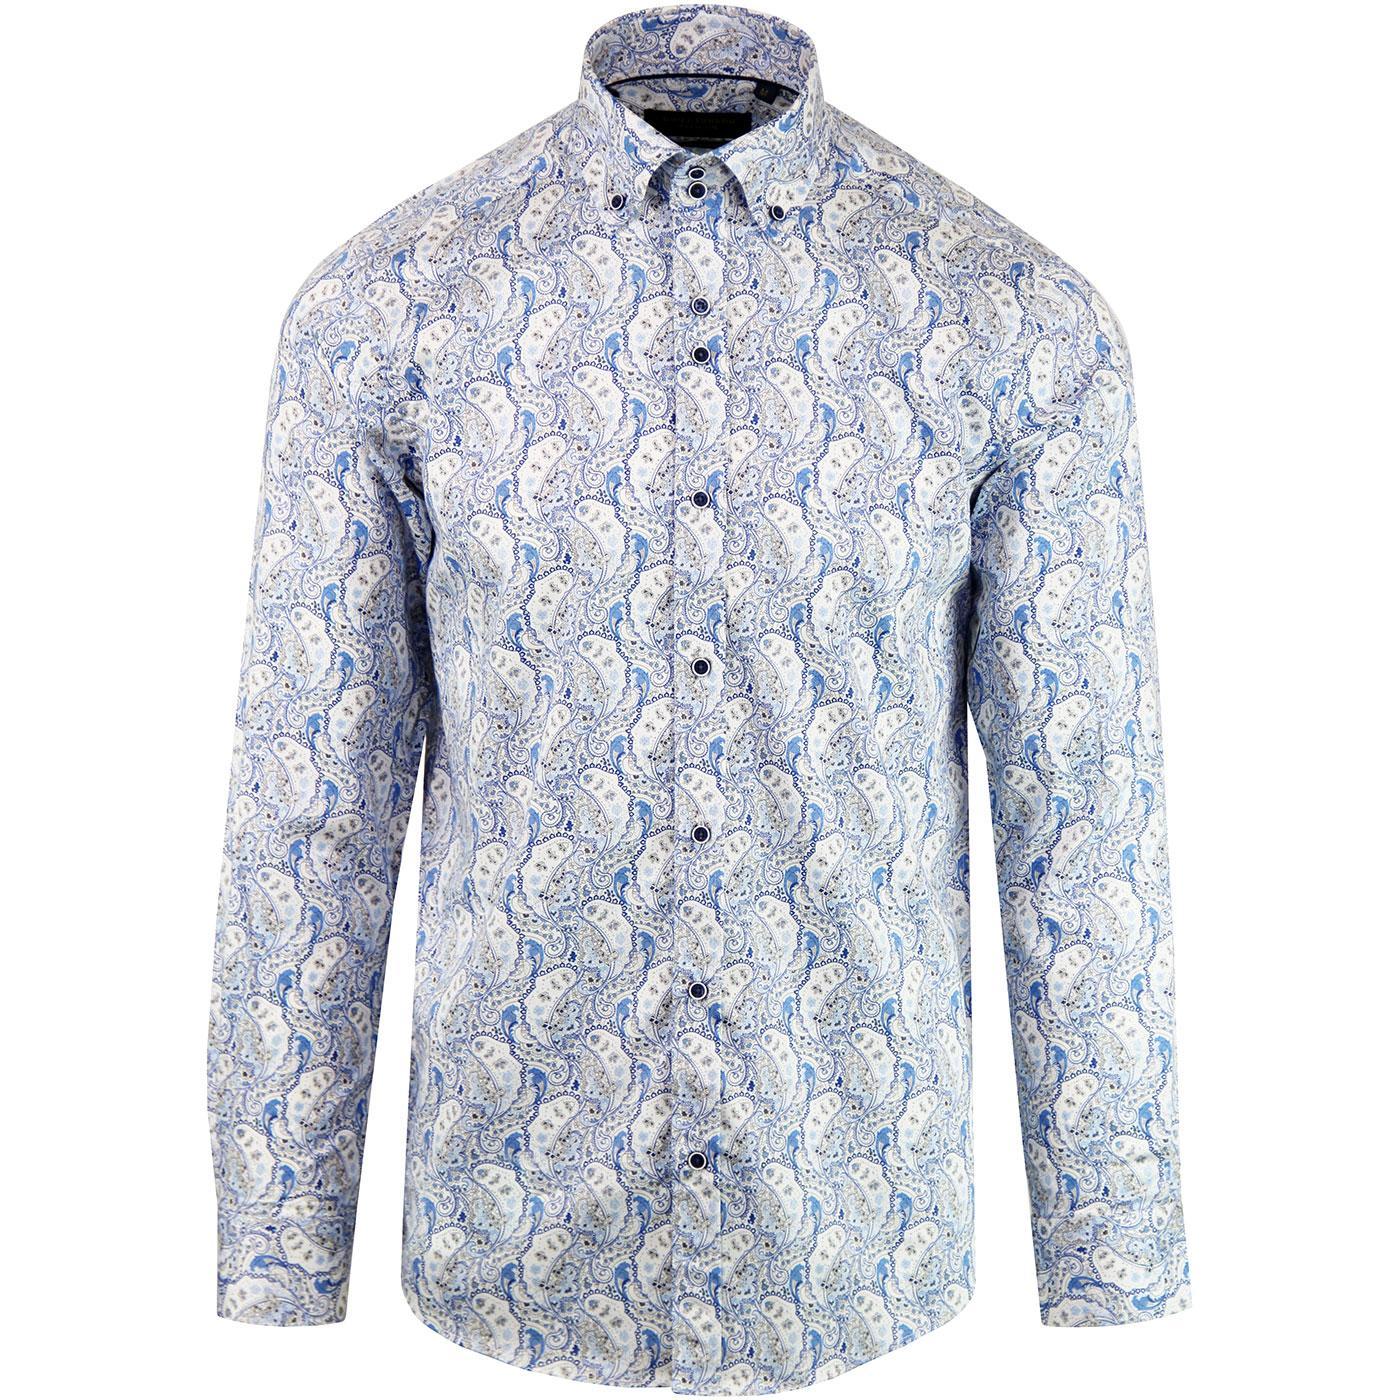 GUIDE LONDON Men's Retro Mod Paisley Dress Shirt